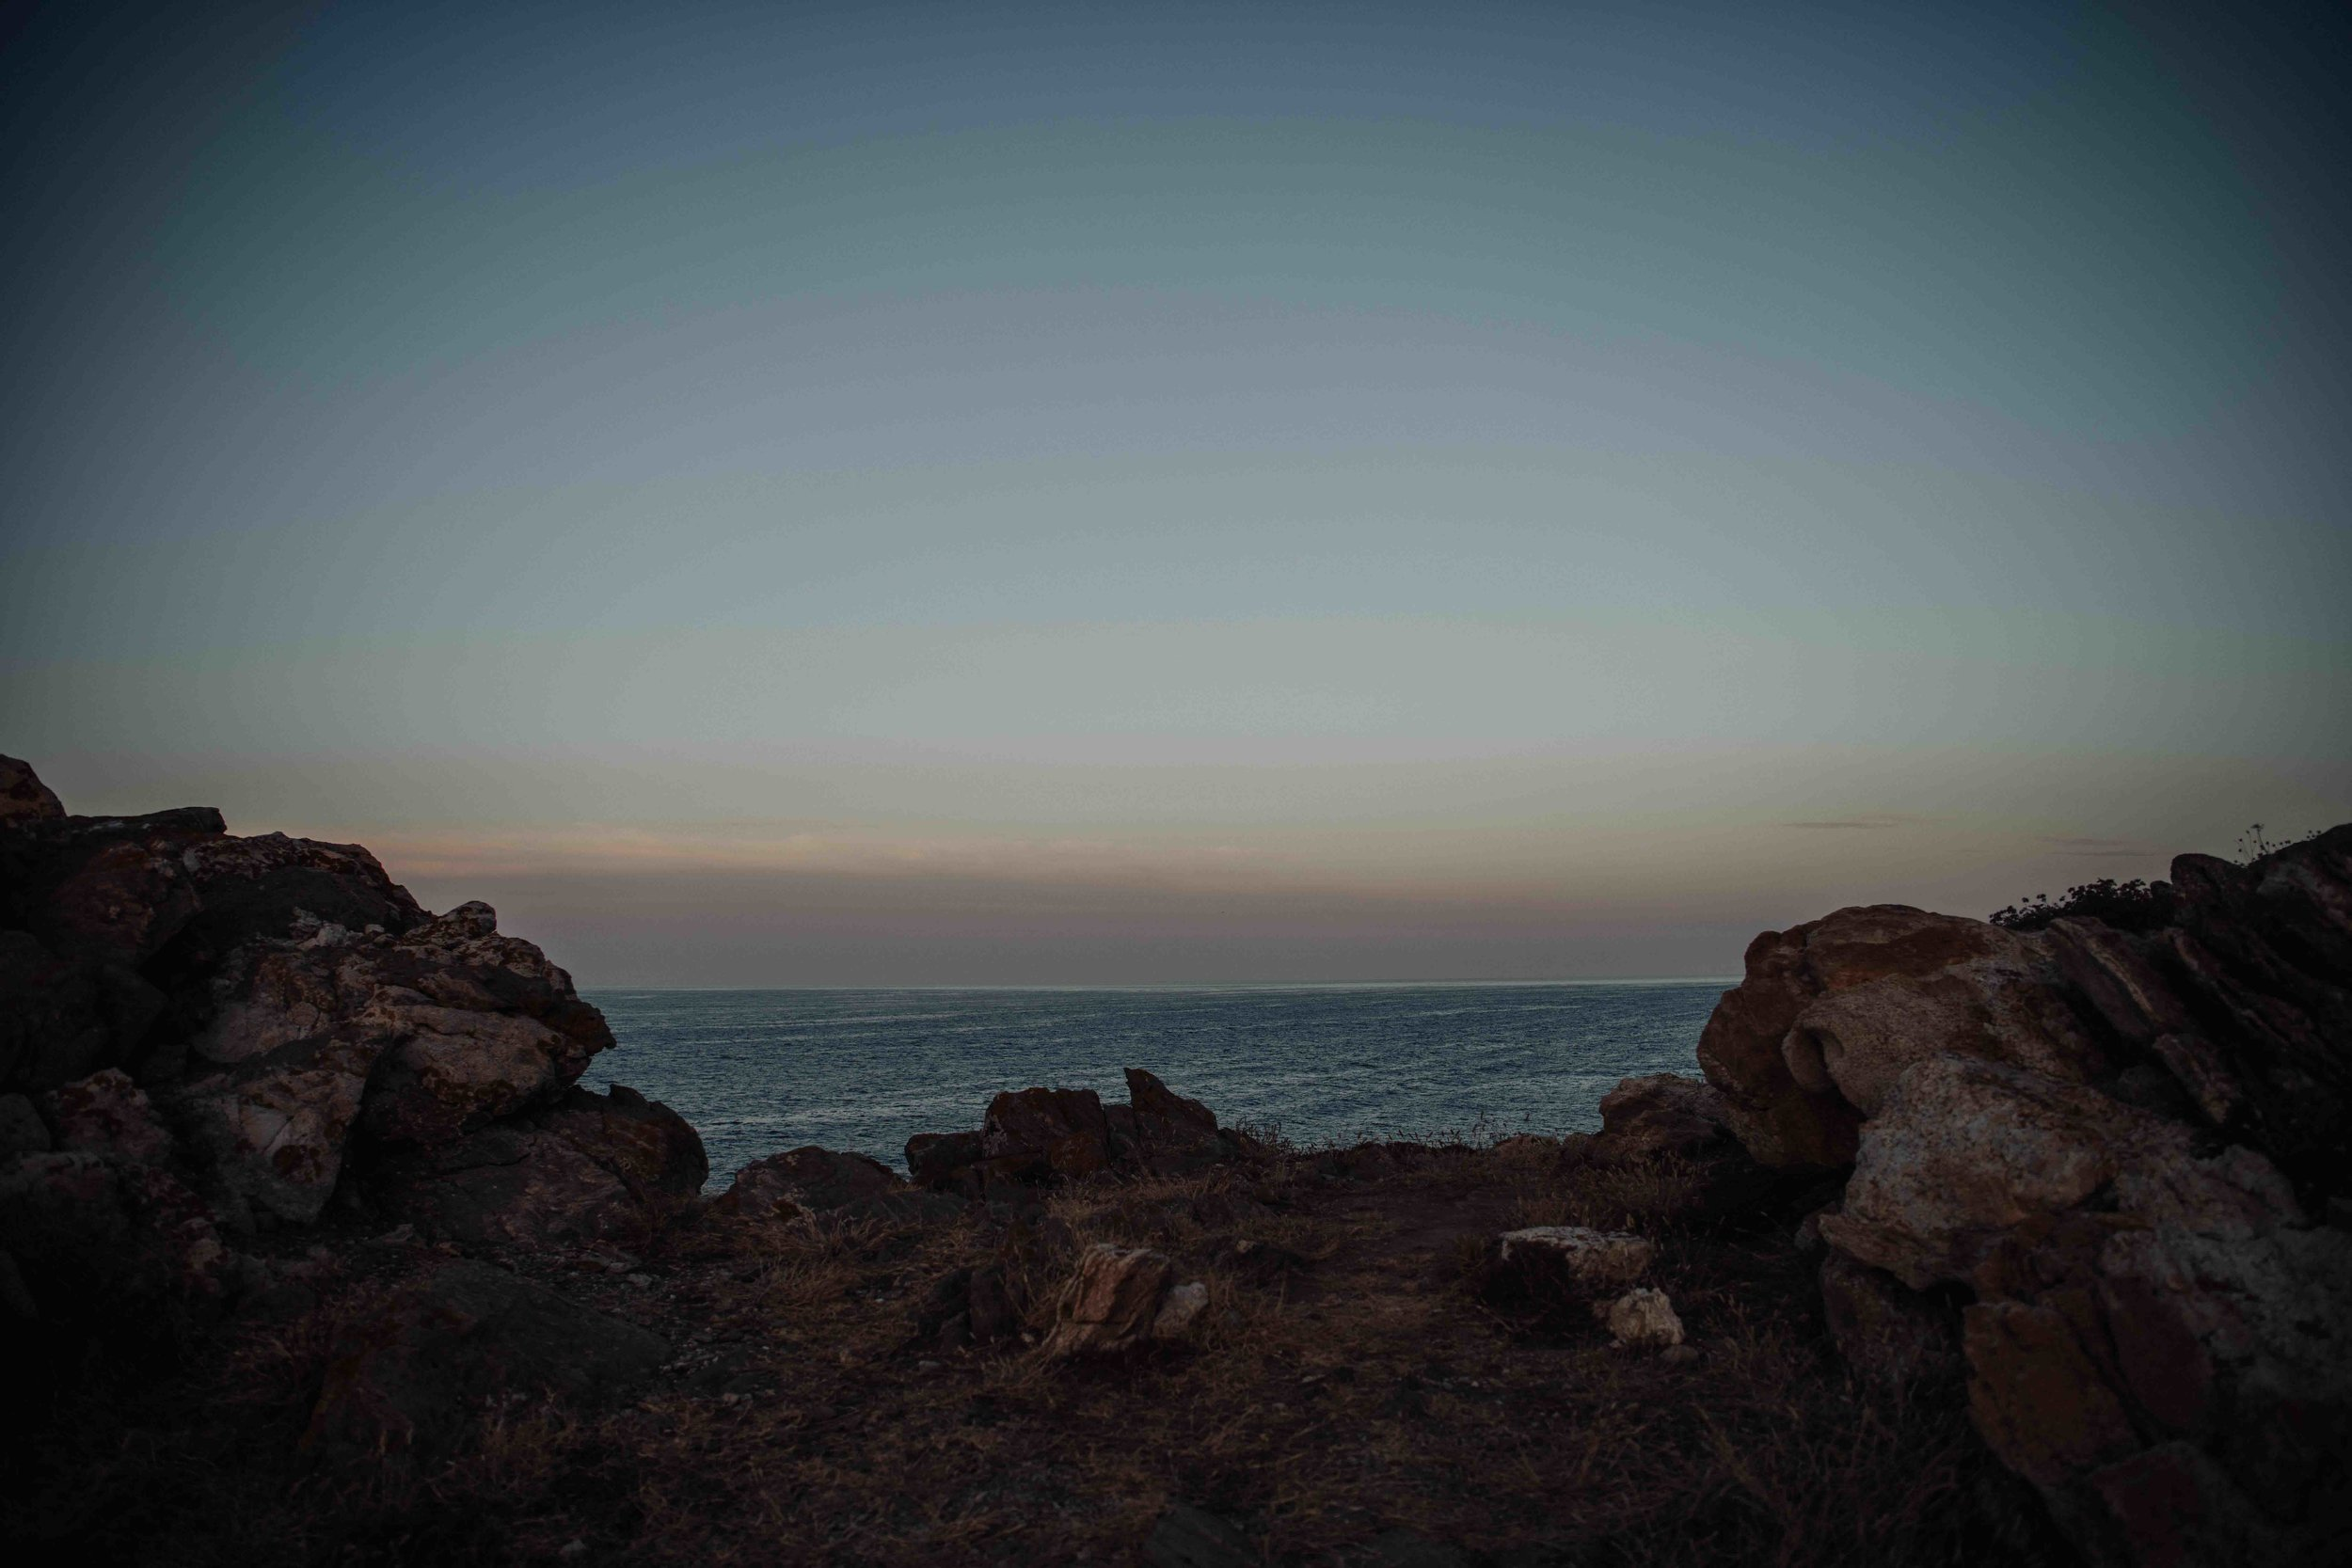 stefano torreggiani-fotografo modena-fotografo porto cervo (24).jpg